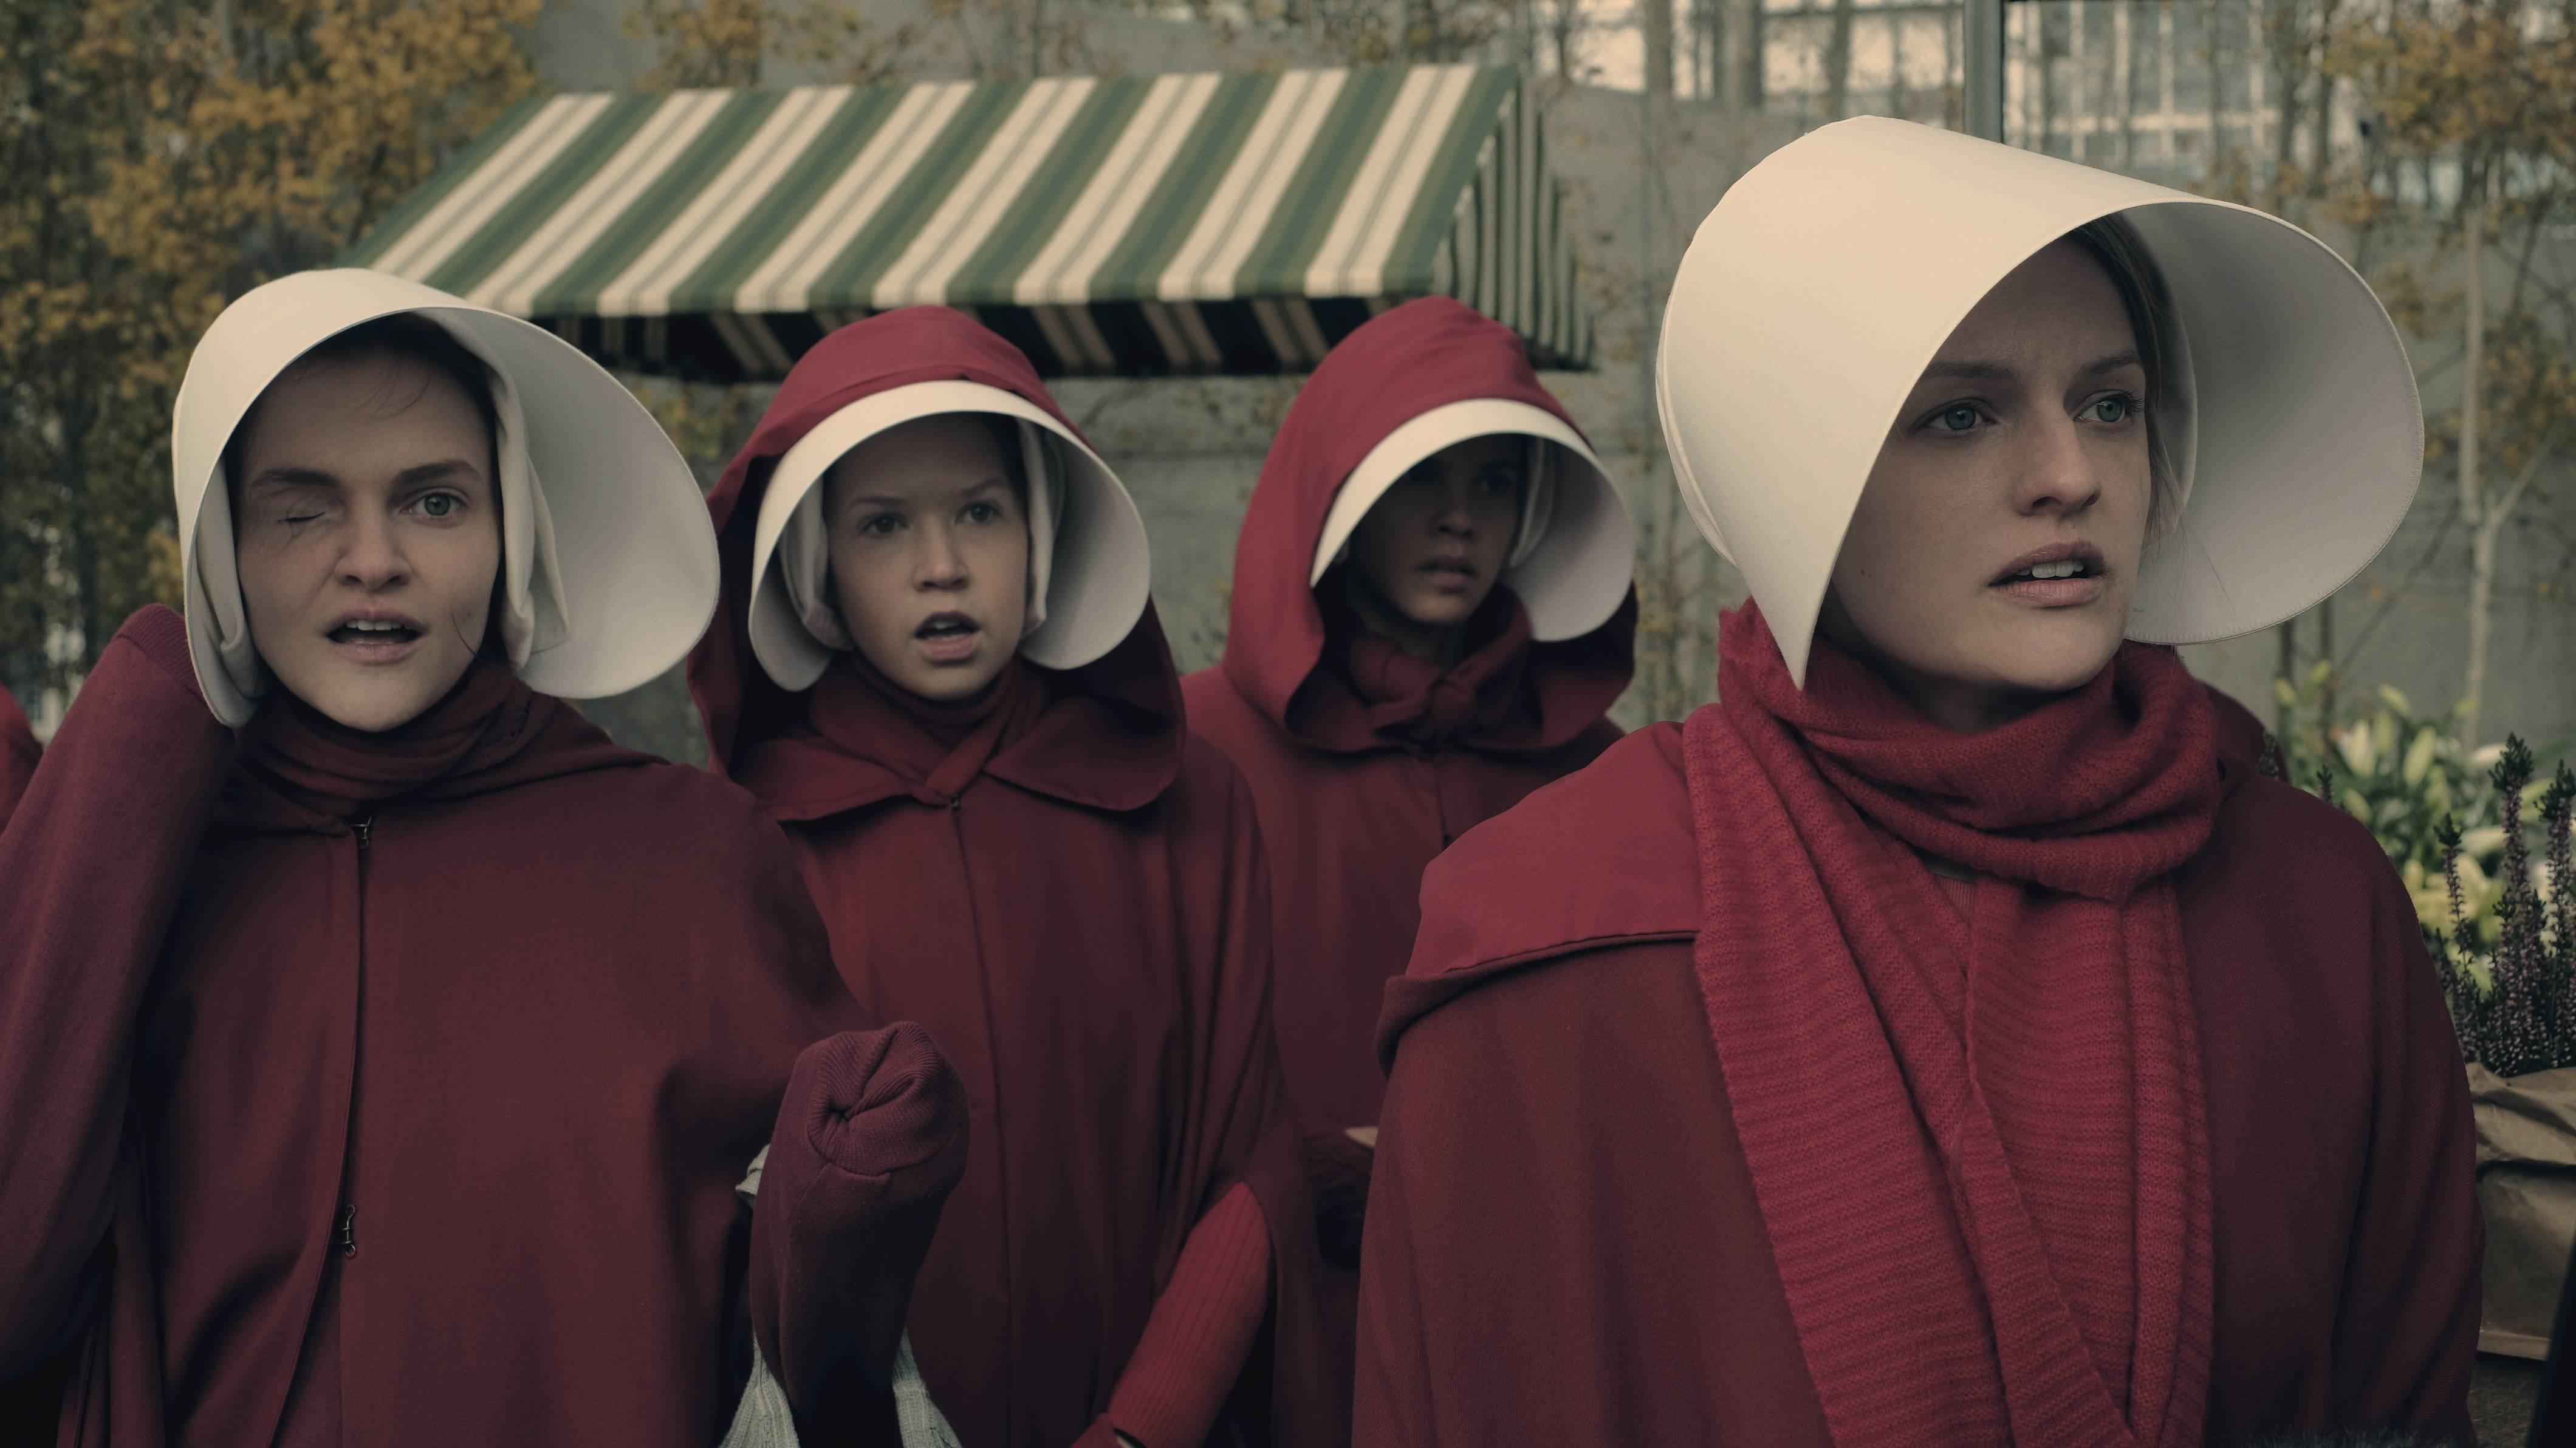 «The Handmaid's Tale»: Αυτό είναι το νέο τρέιλερ της δεύτερης σεζόν